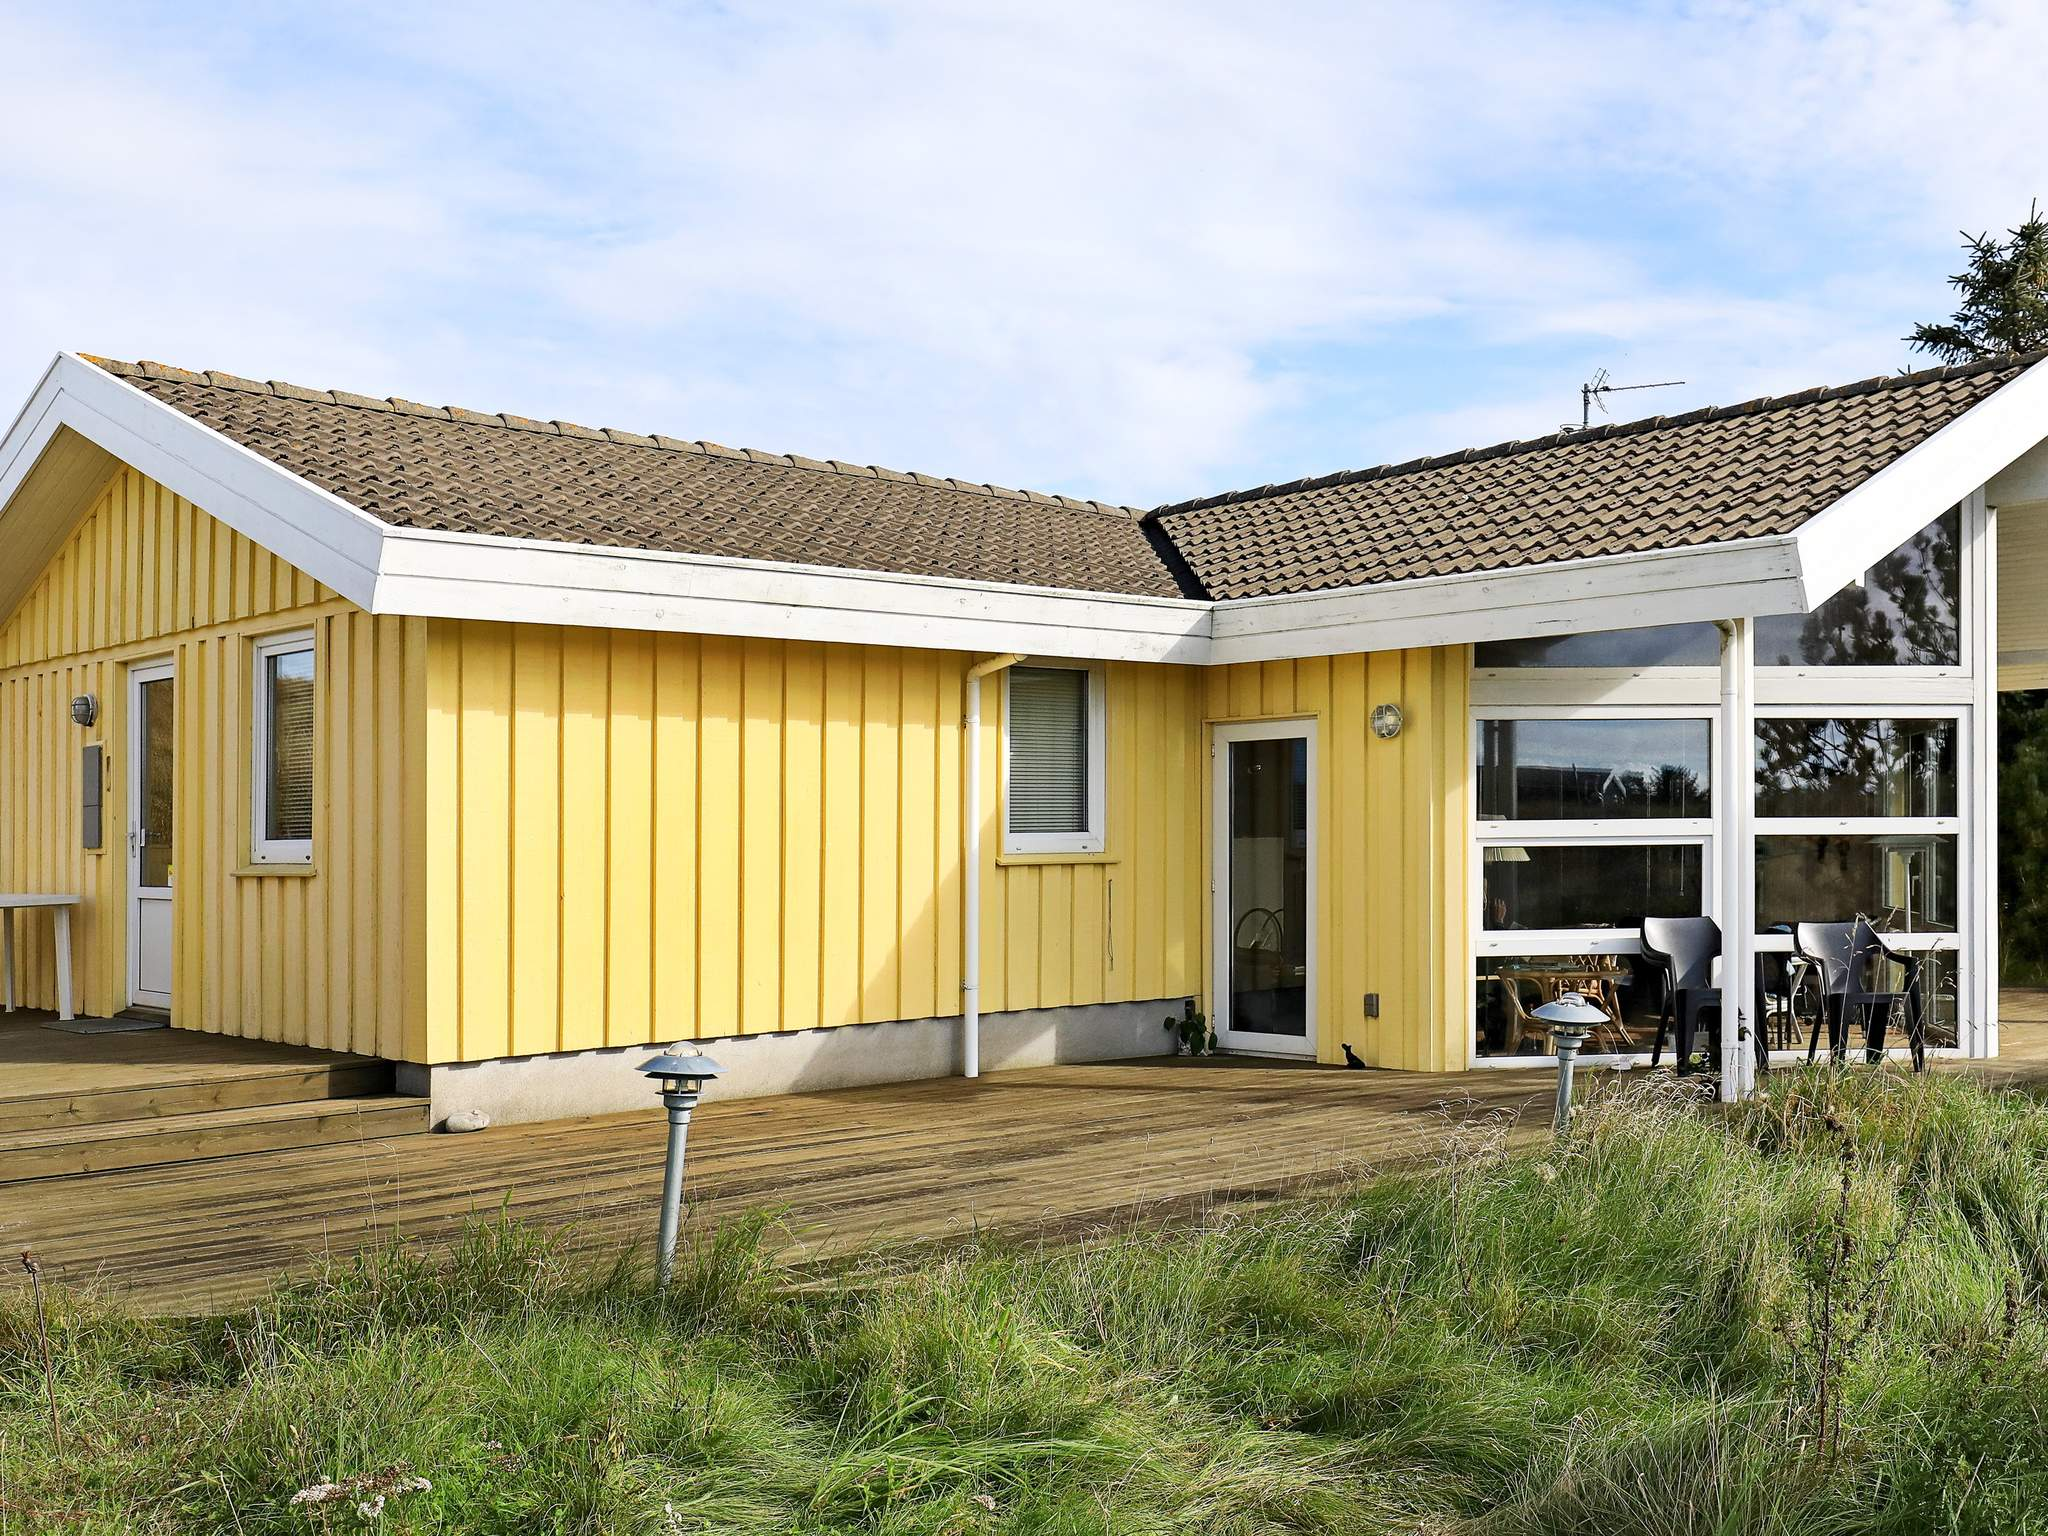 Ferienhaus Tversted (82208), Tversted, , Nordwestjütland, Dänemark, Bild 1